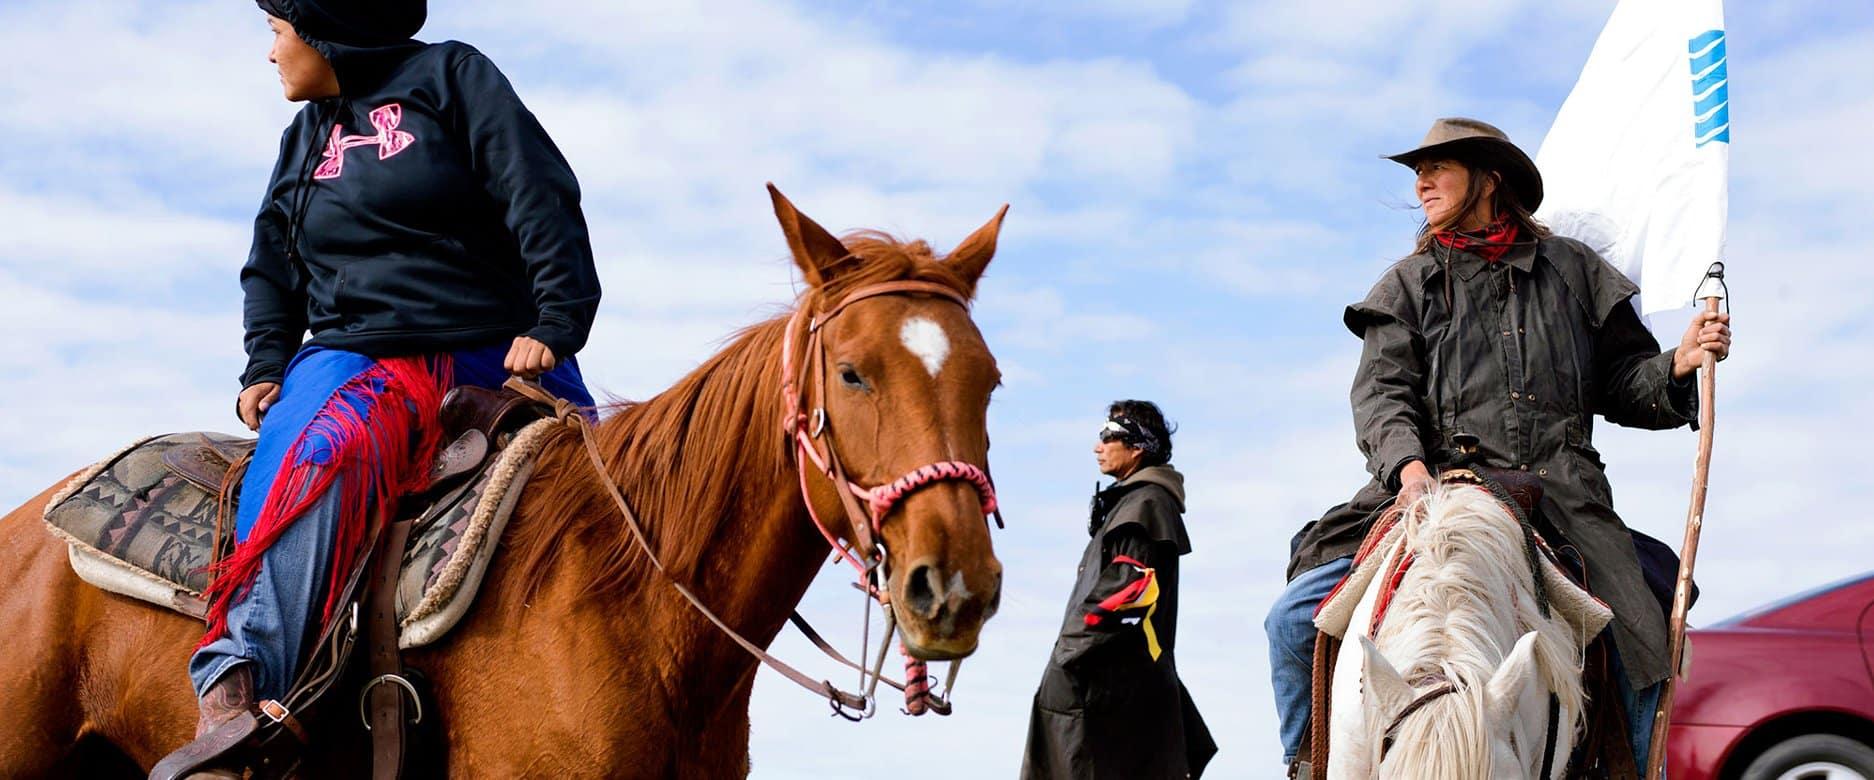 rustic horses native american riding